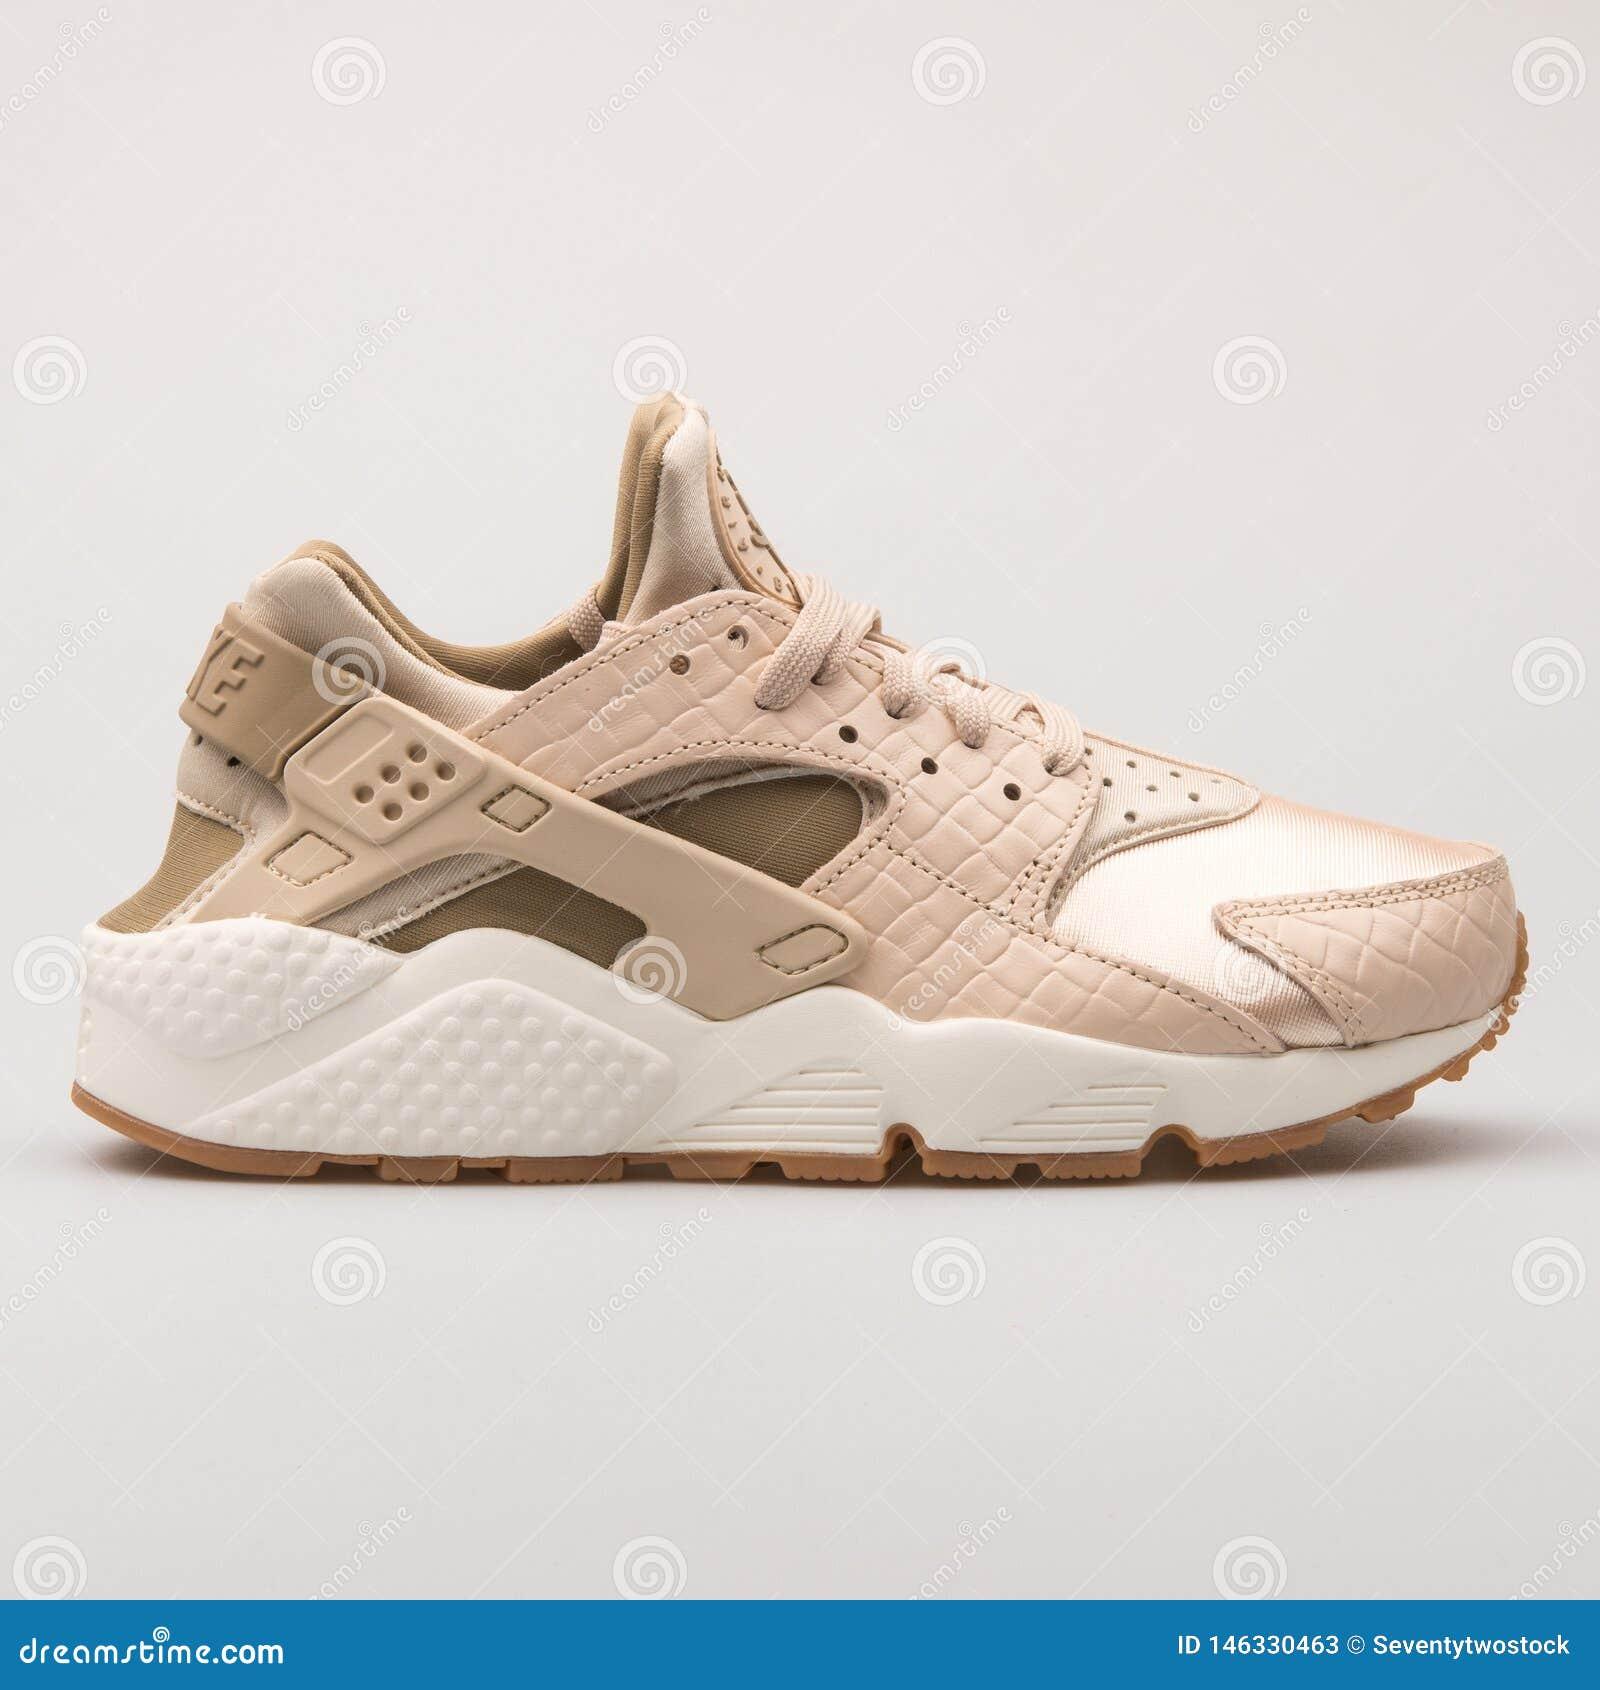 Nike Air Huarache Run Premium Khaki Sneaker Editorial Stock Photo ...